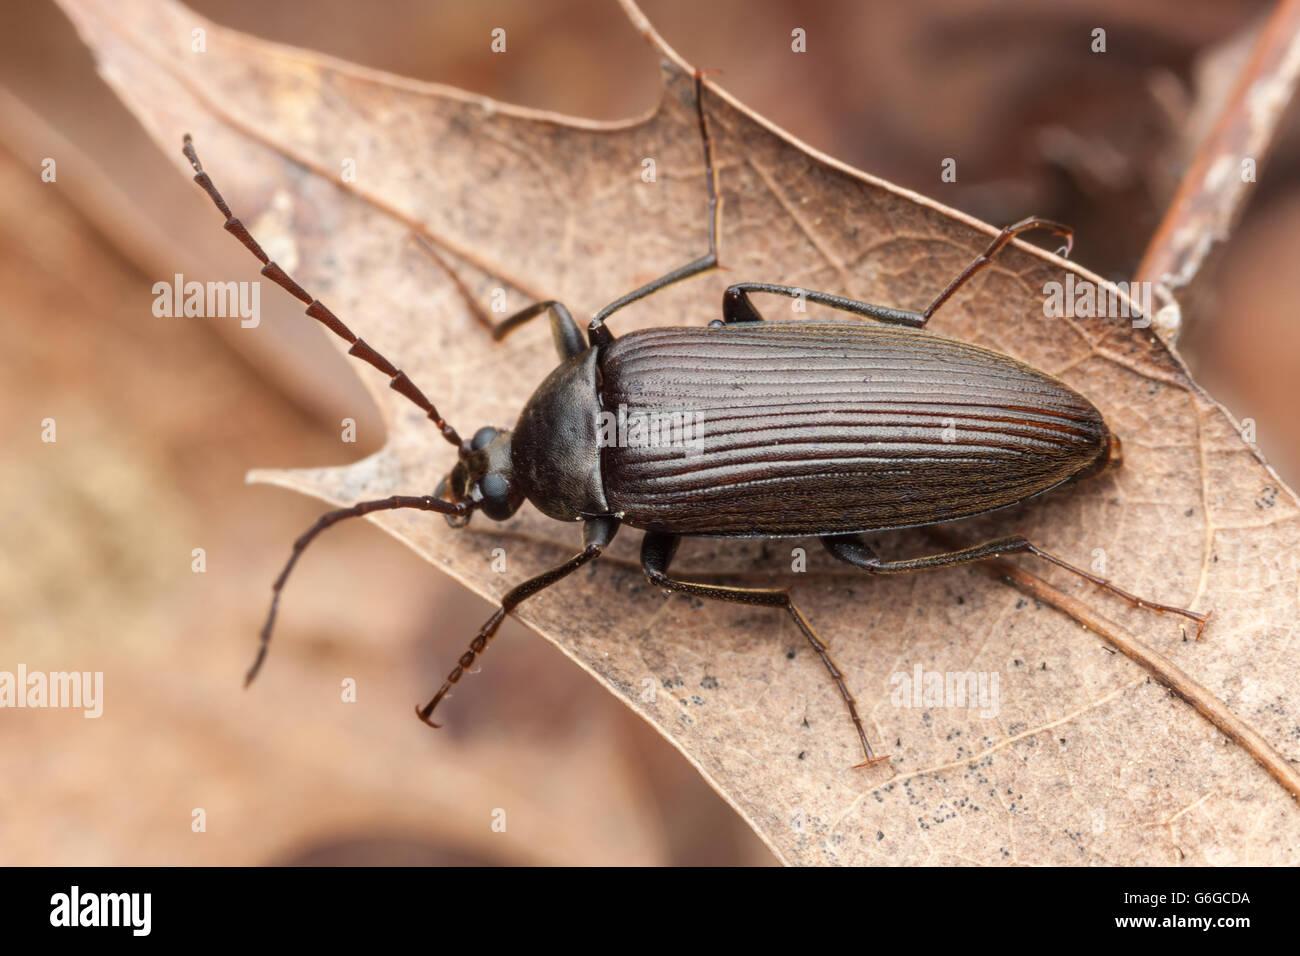 A Darkling Beetle (Capnochroa fuliginosa) perches on a dead leaf. - Stock Image